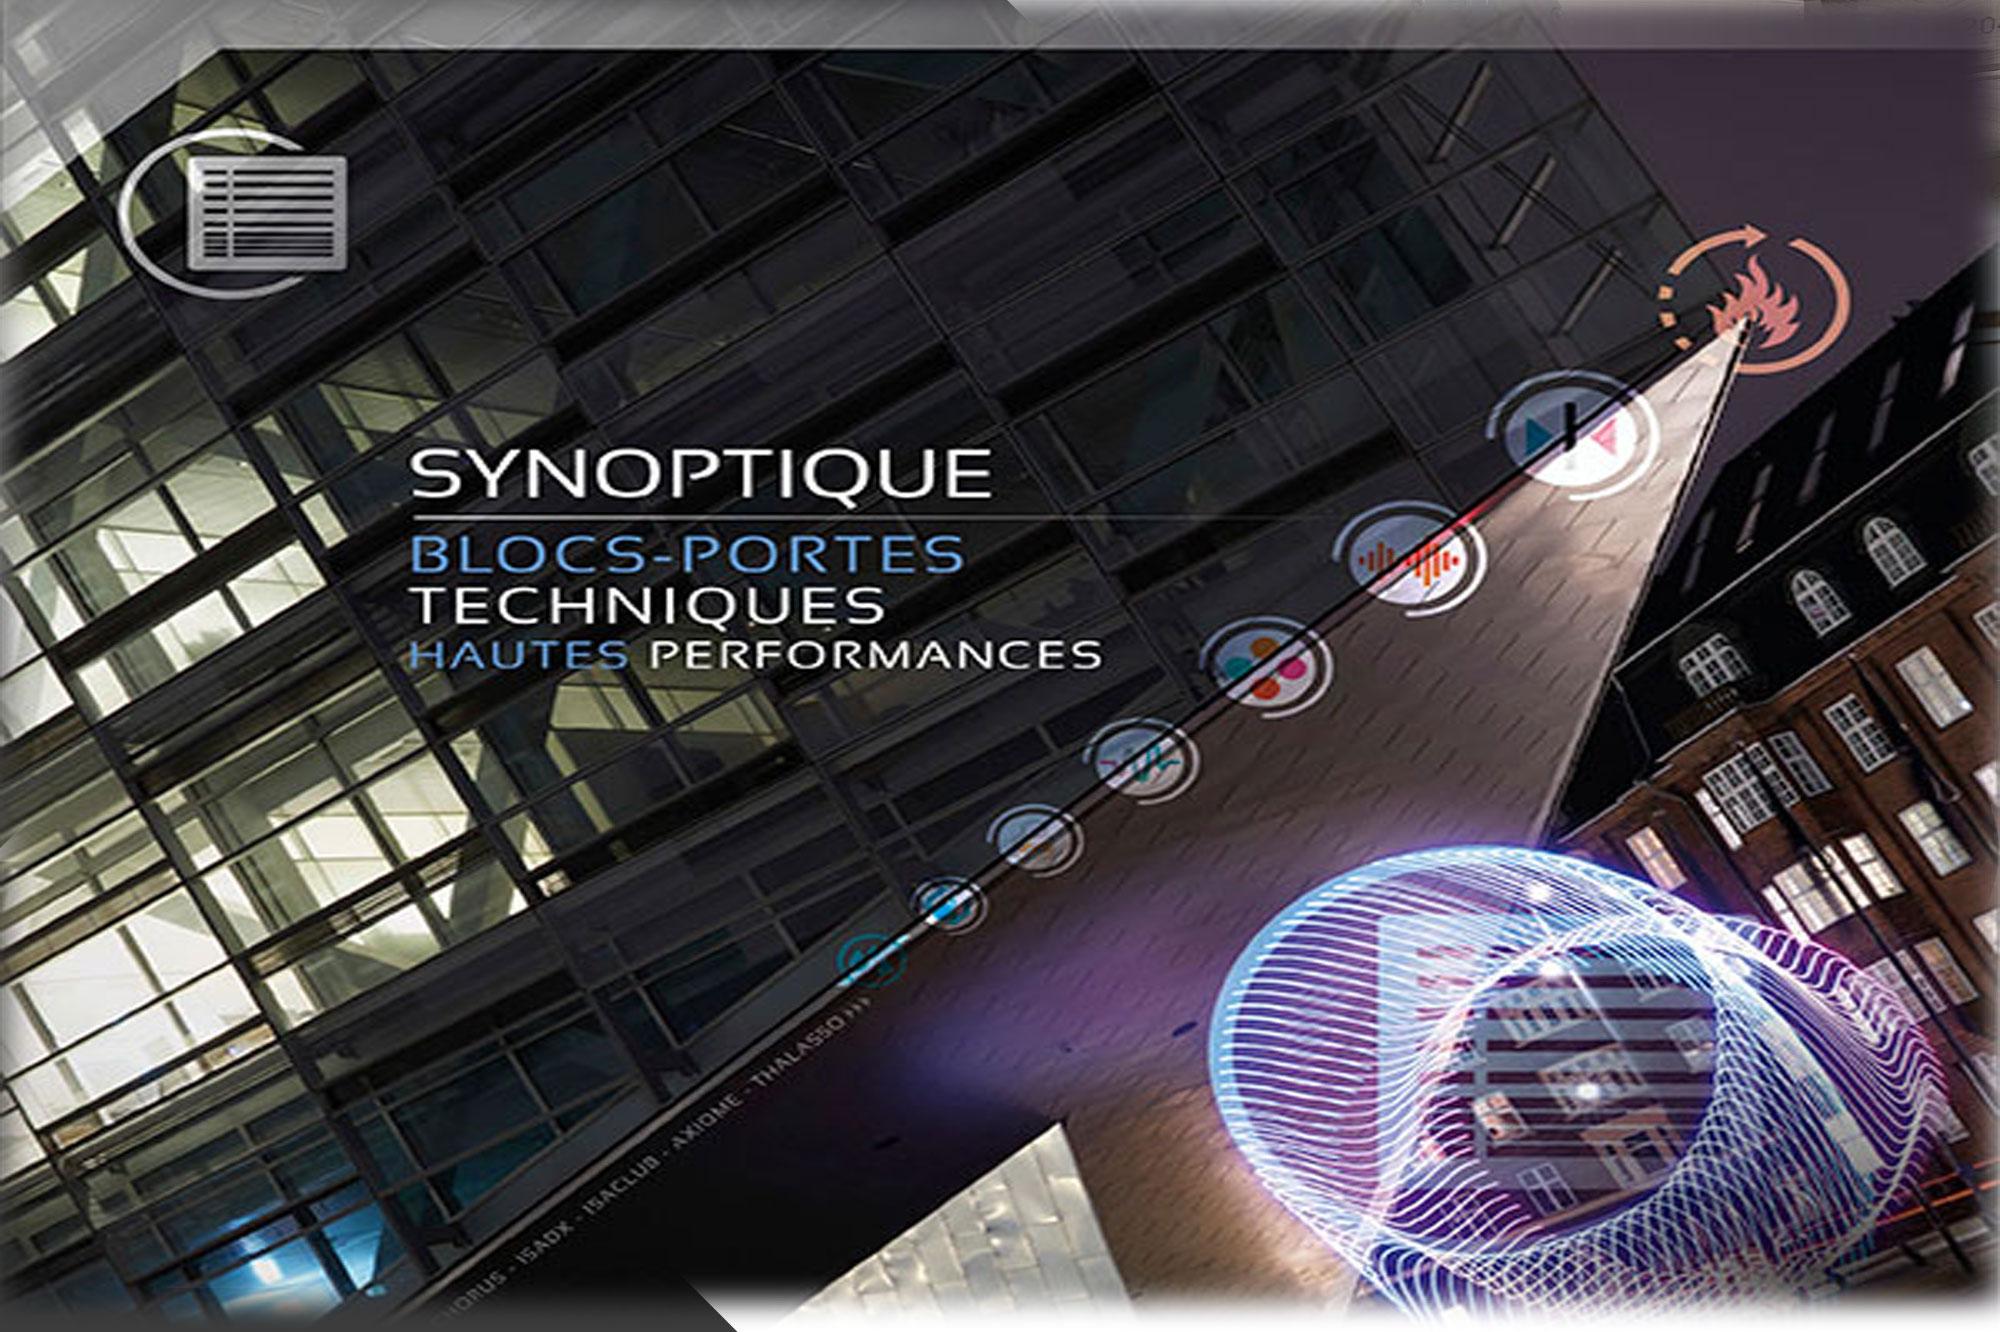 Synoptique Blocs-Portes Techniques